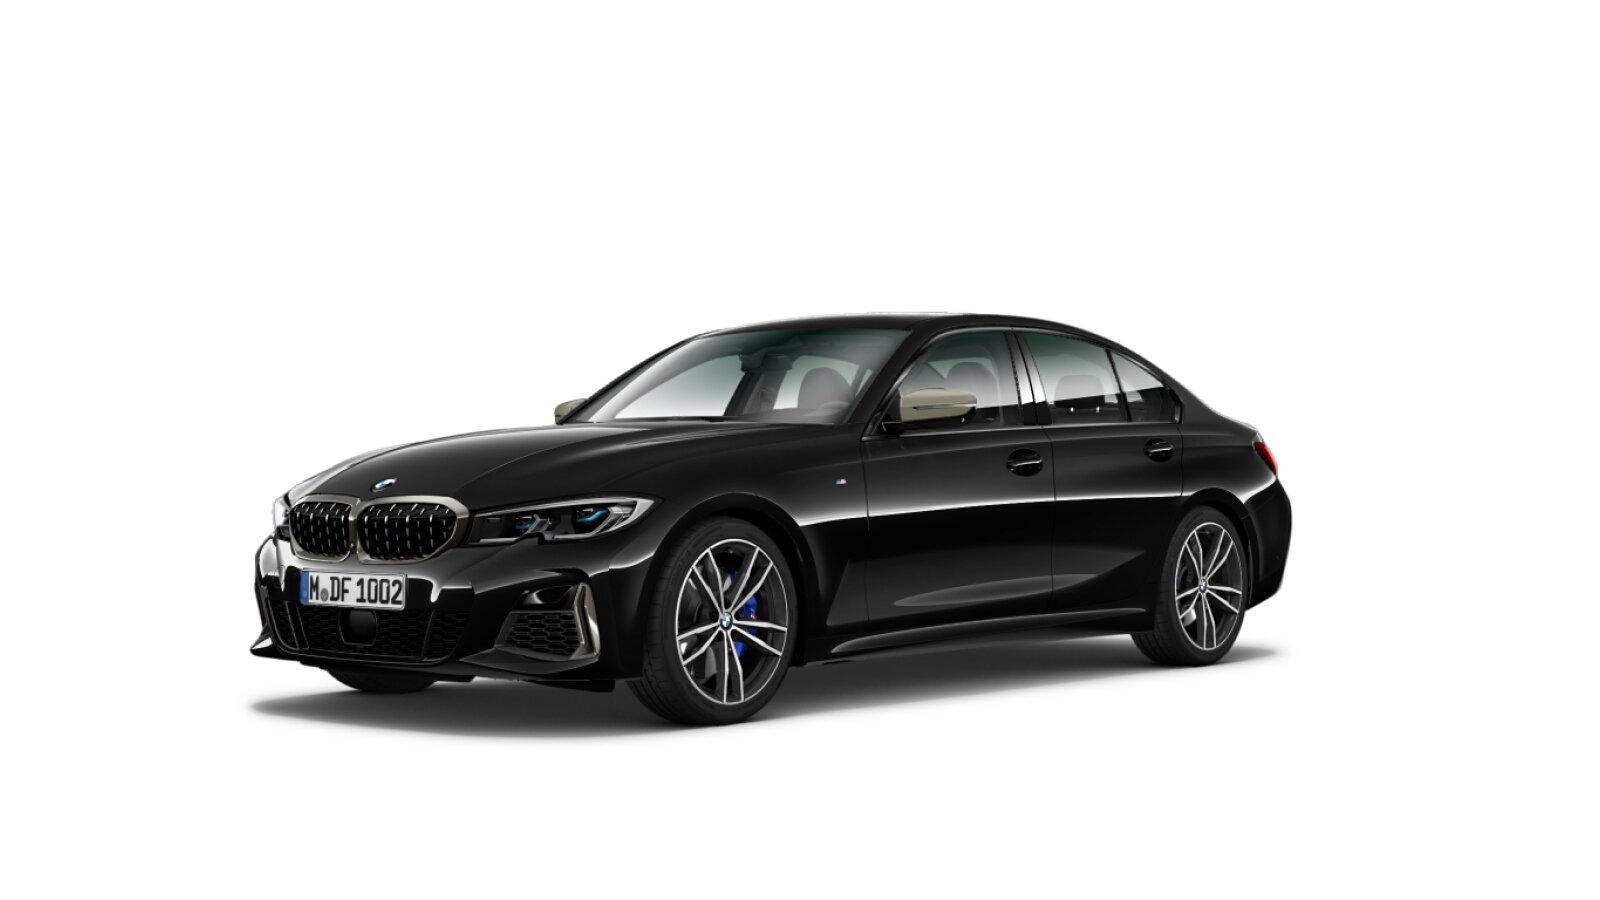 BMW 3 Series 2019 leaked photos (7)